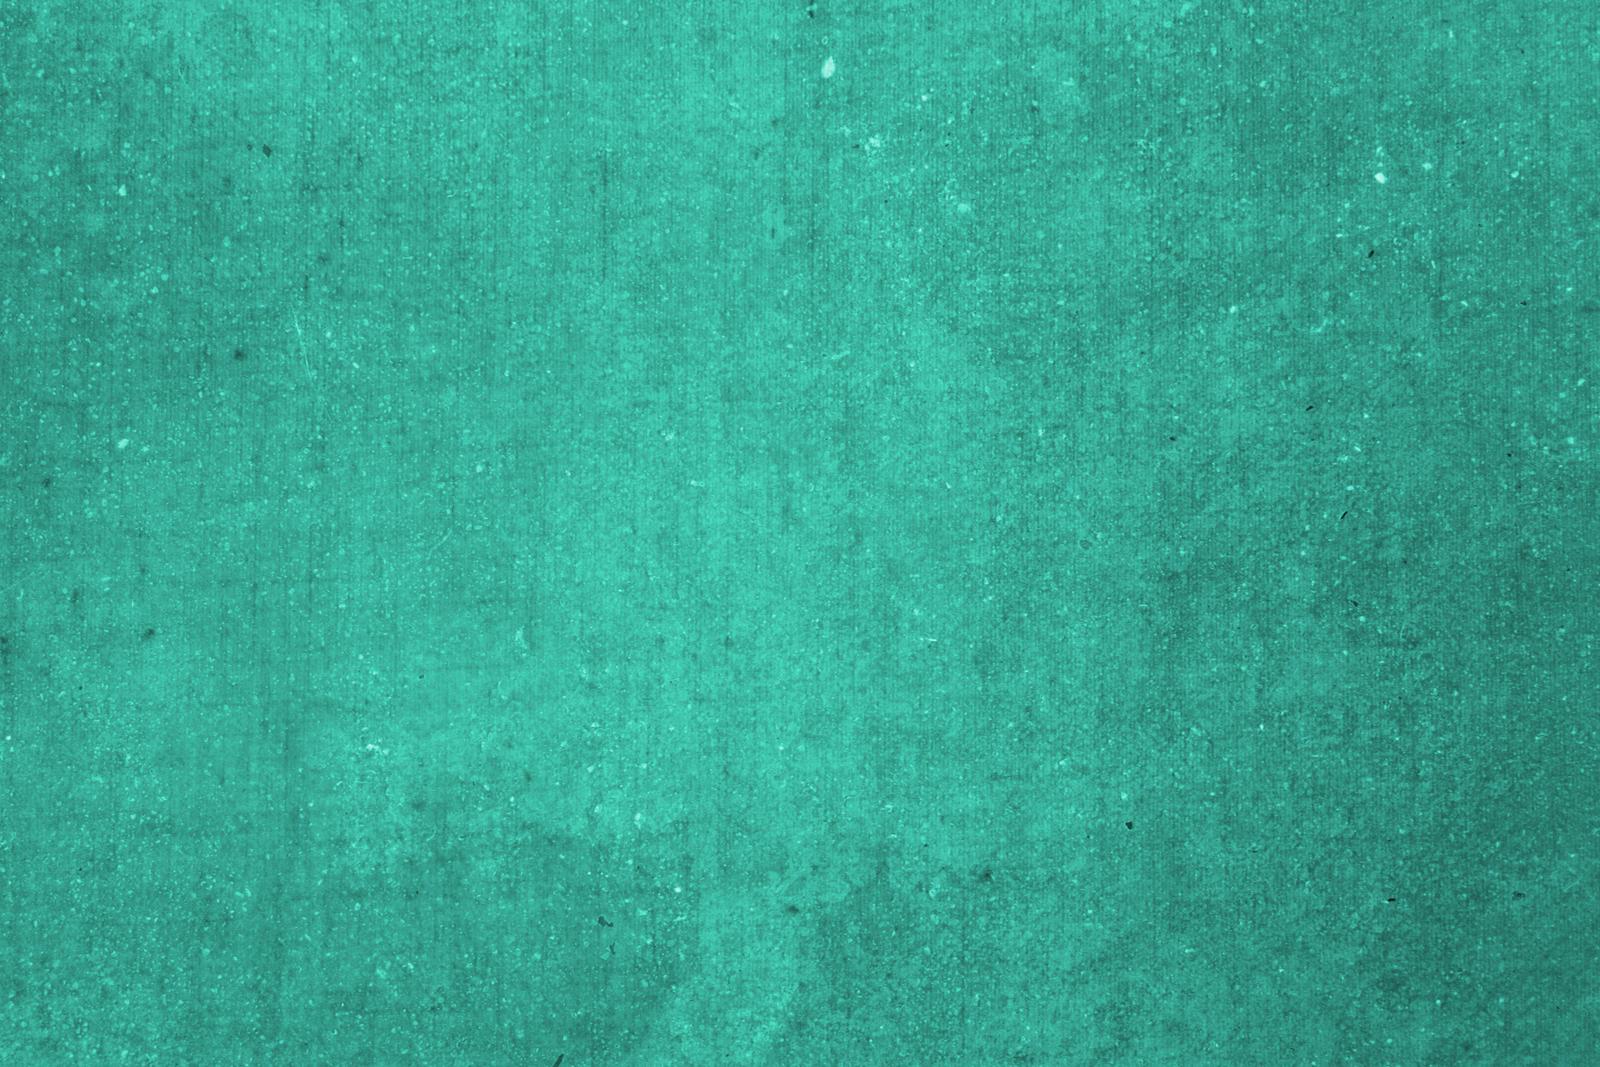 green grunge texture thumb - photo #8